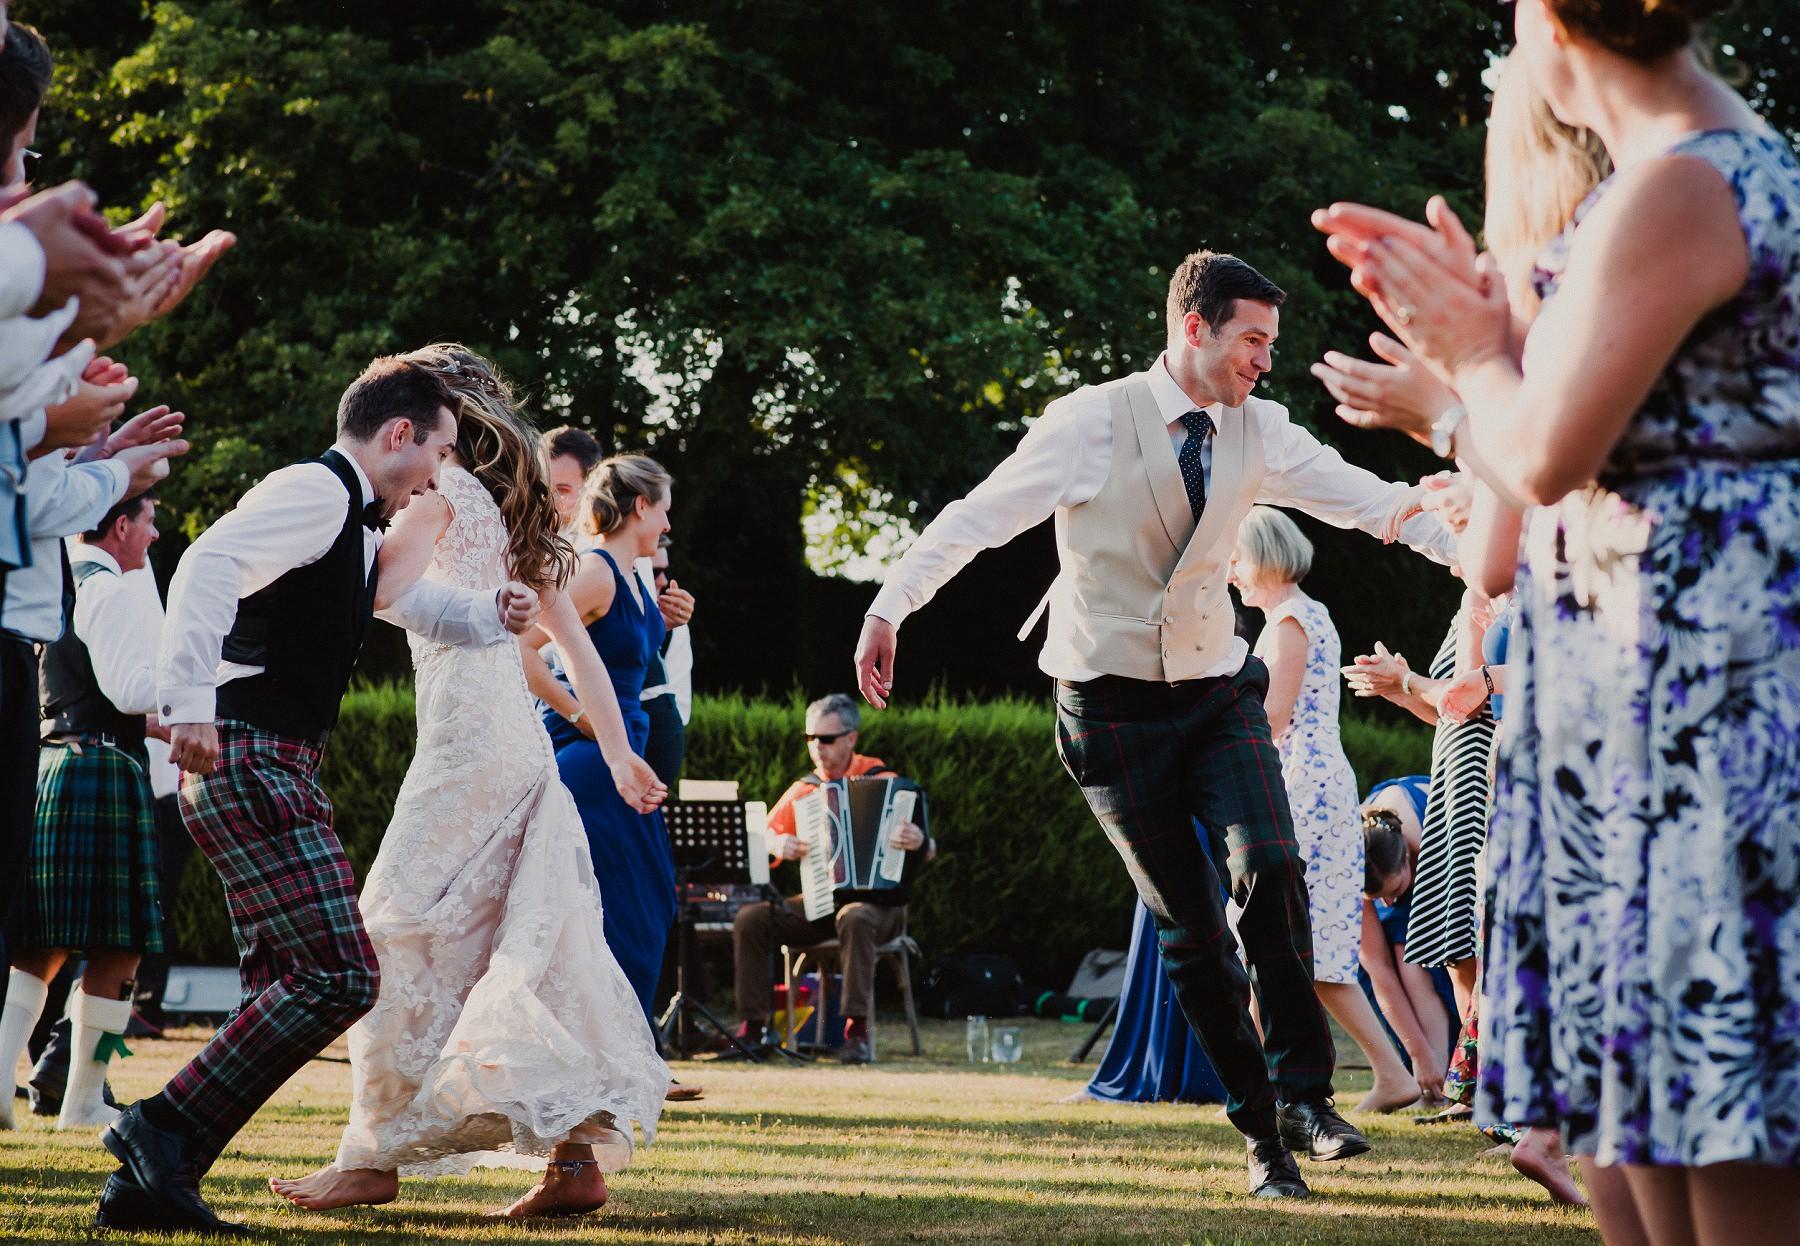 Izzy and Rob Wedding The Elms_0001.jpg